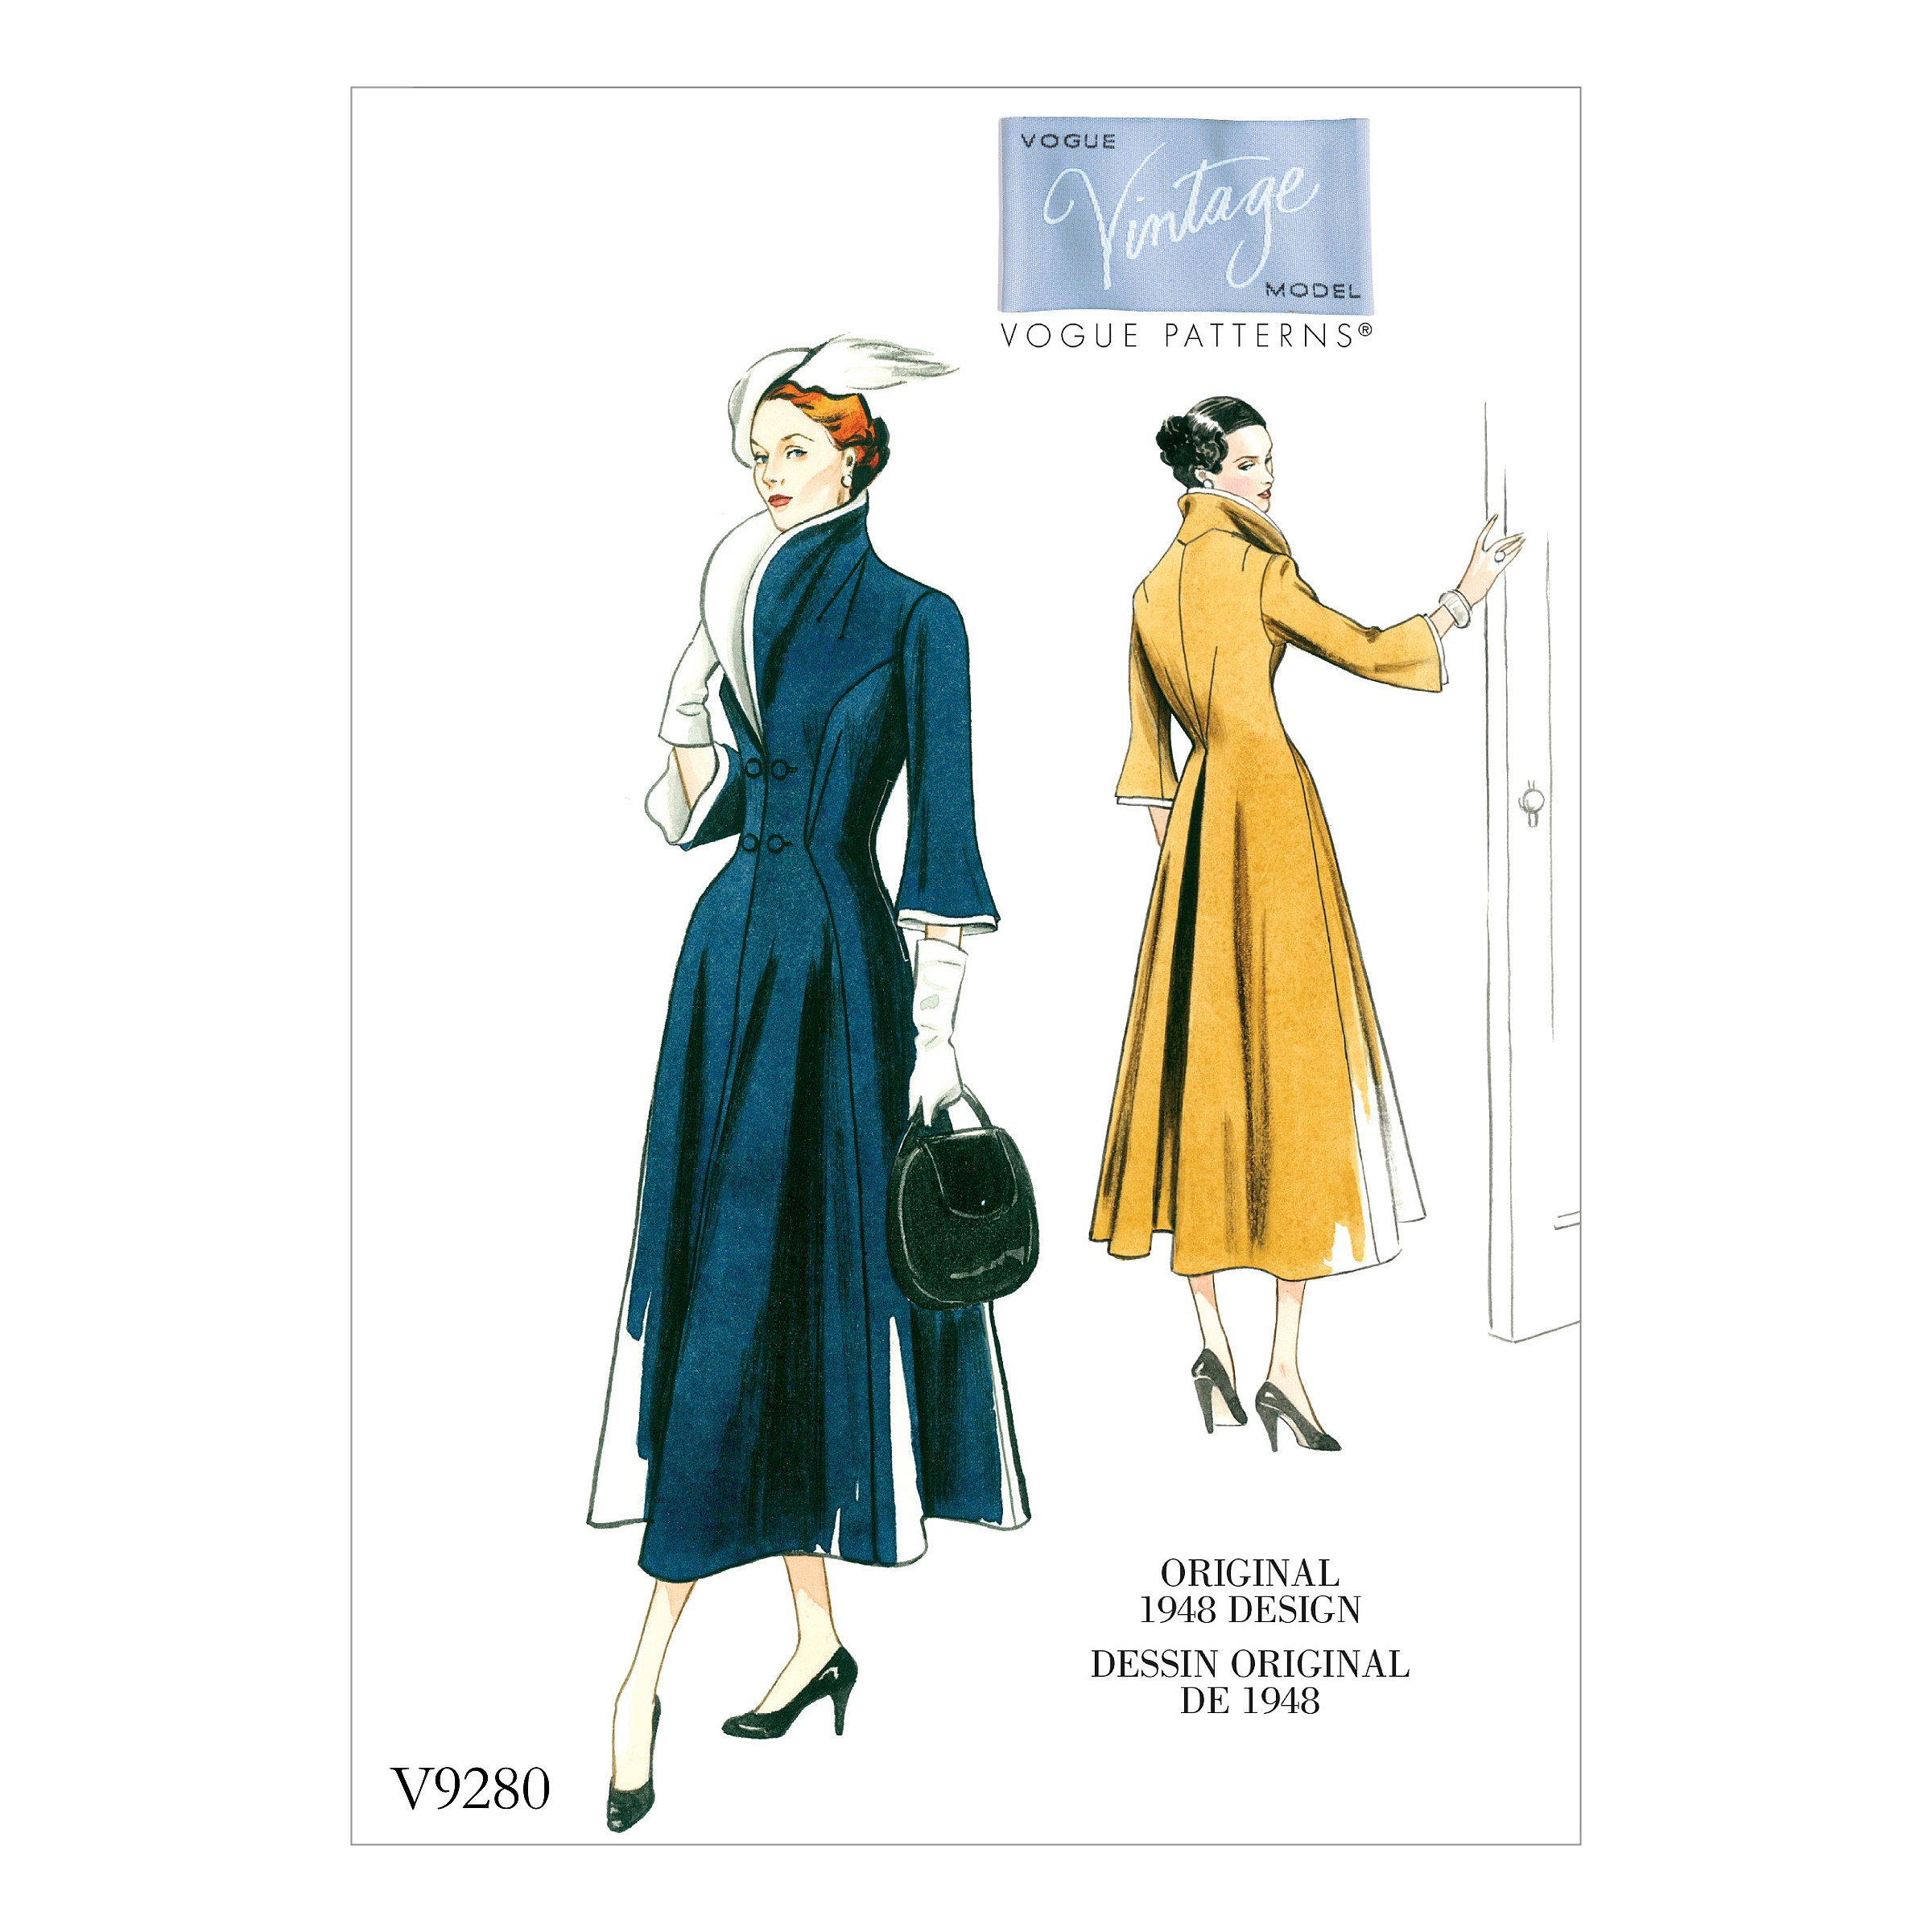 Vogue Sewing Pattern V9280 Women's Vintage High Collar Fit & Flare Dress